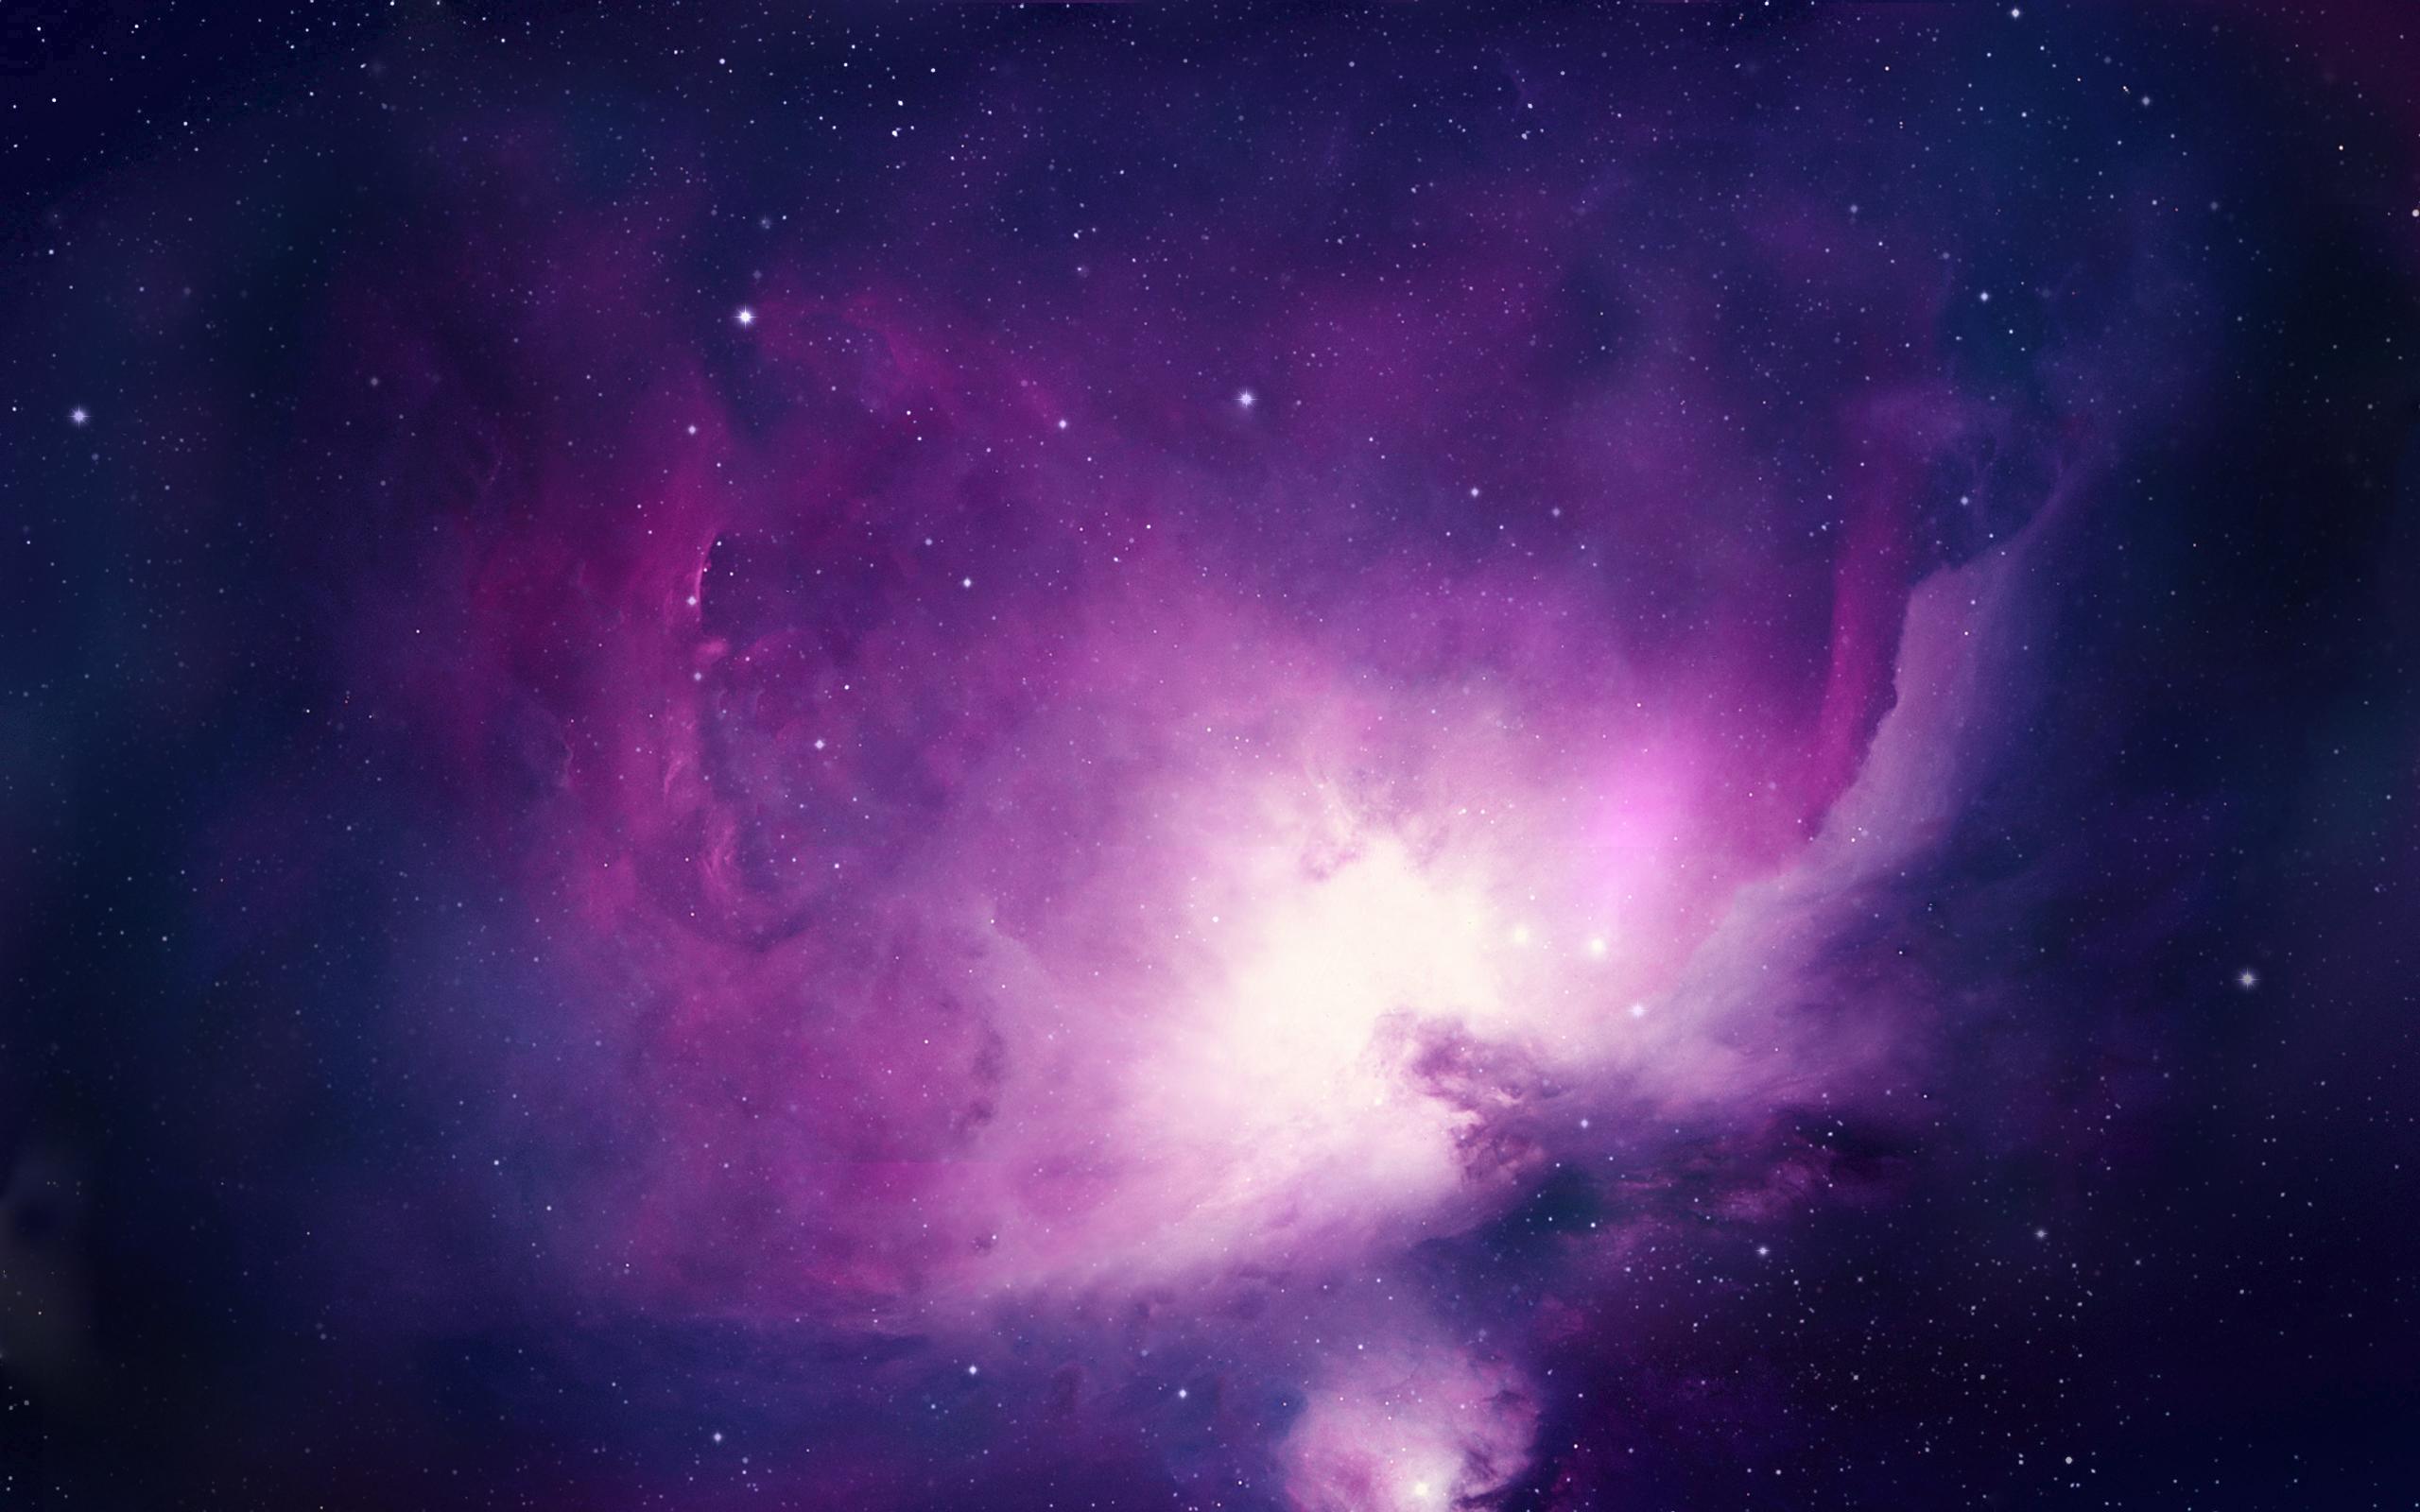 Cool Mac OS Purple Computer Wallpaper 1811 Wallpaper 2560x1600